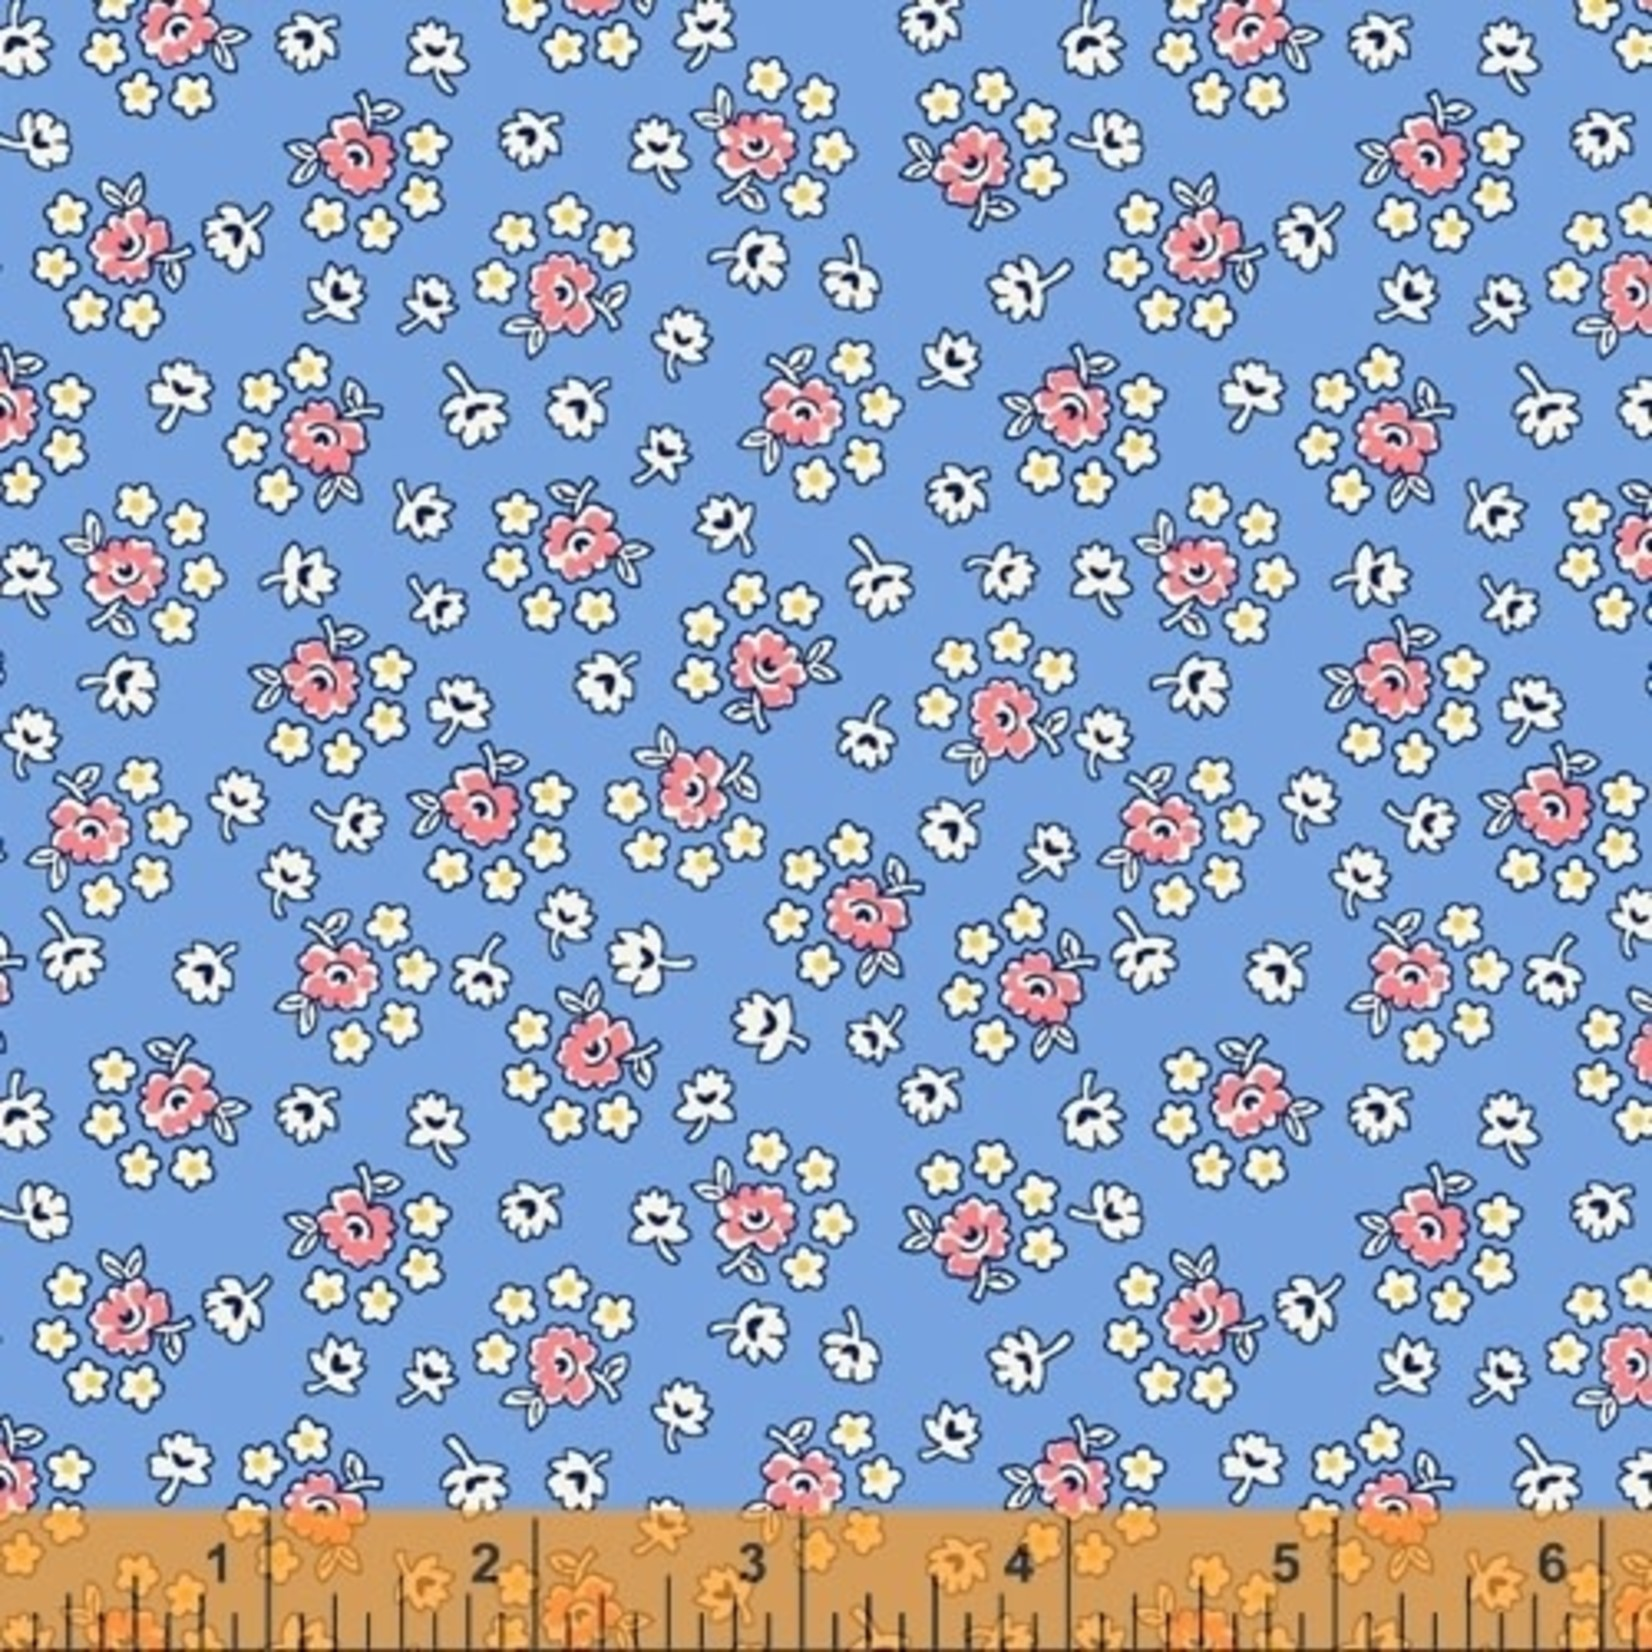 Windham Fabrics STORYBOOK, BOUQUET, BLUE (51982-2) PER CM OR $20/M